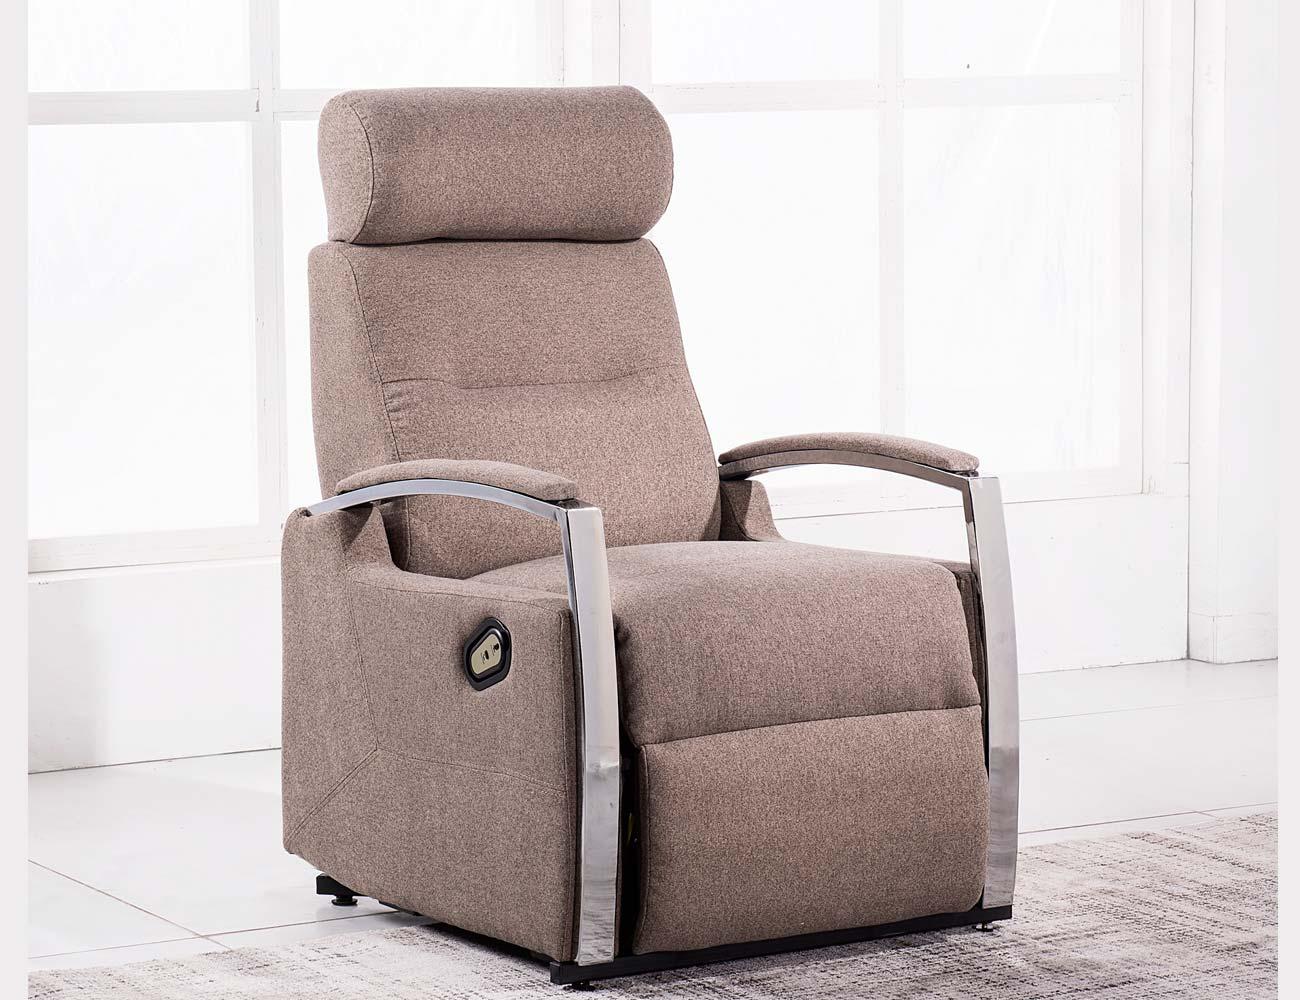 Sillon relax levanta personas power lift masaje calor moka 2